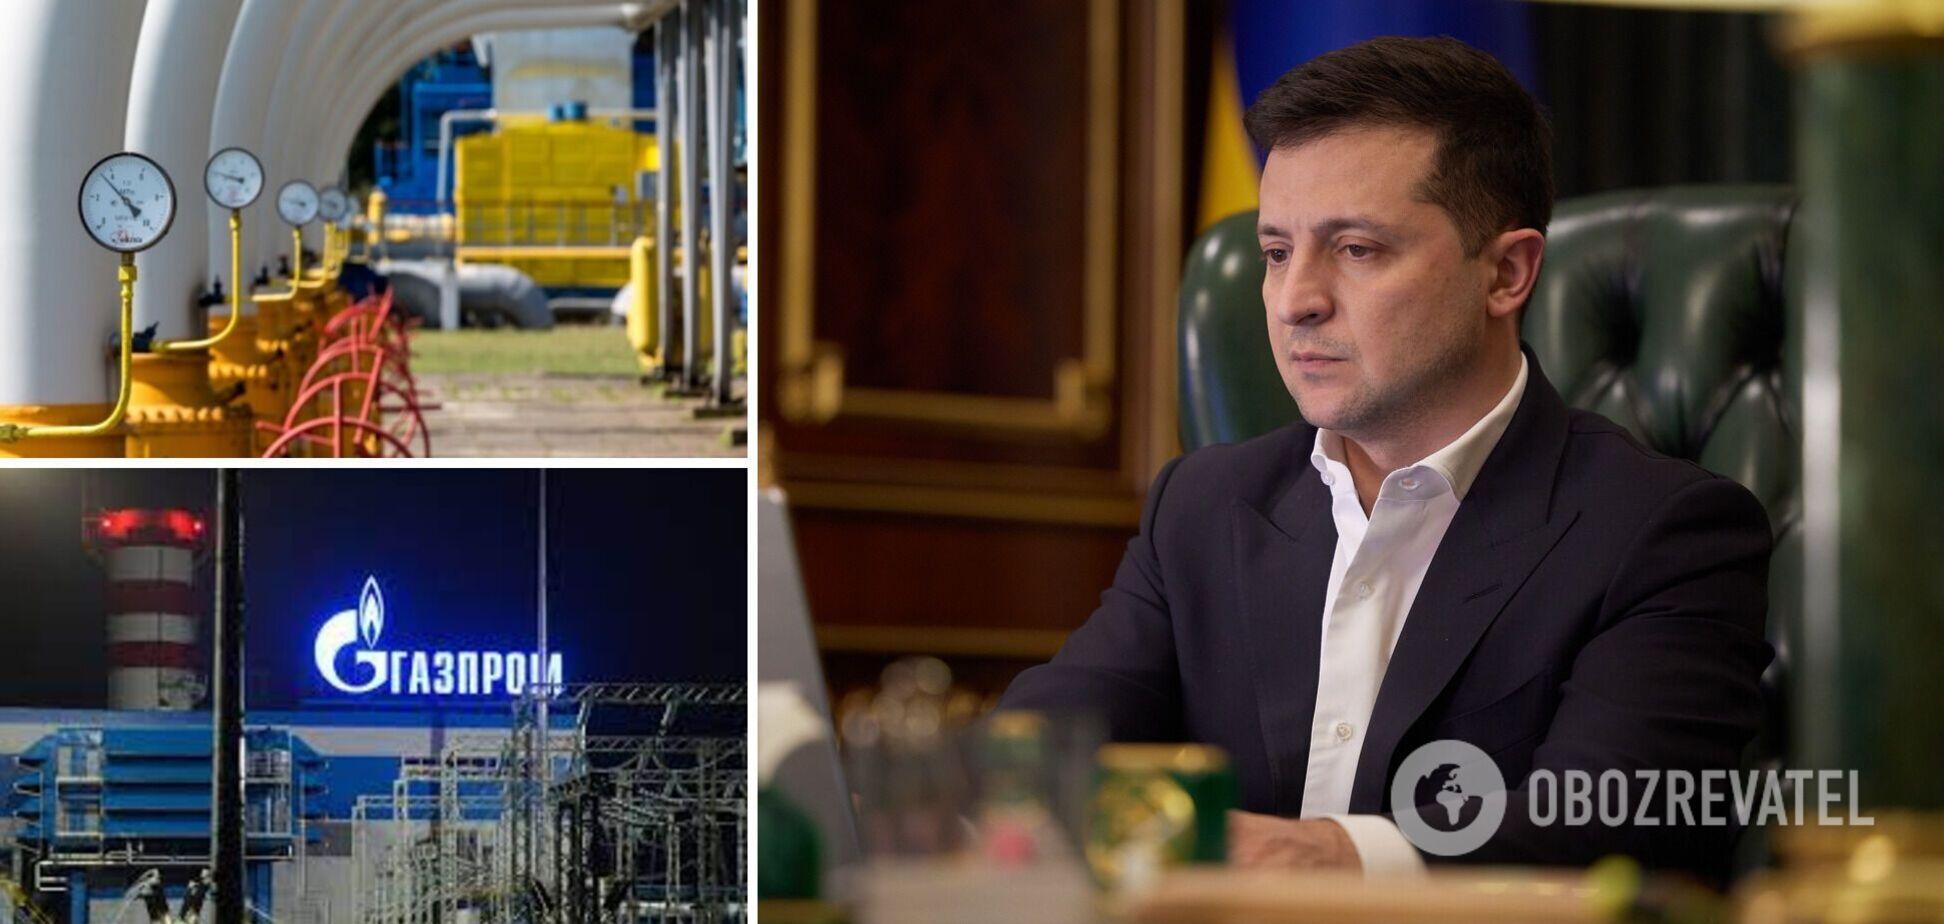 Зеленский предложил России скидку в 50% на транзит газа в Европу – Bloomberg